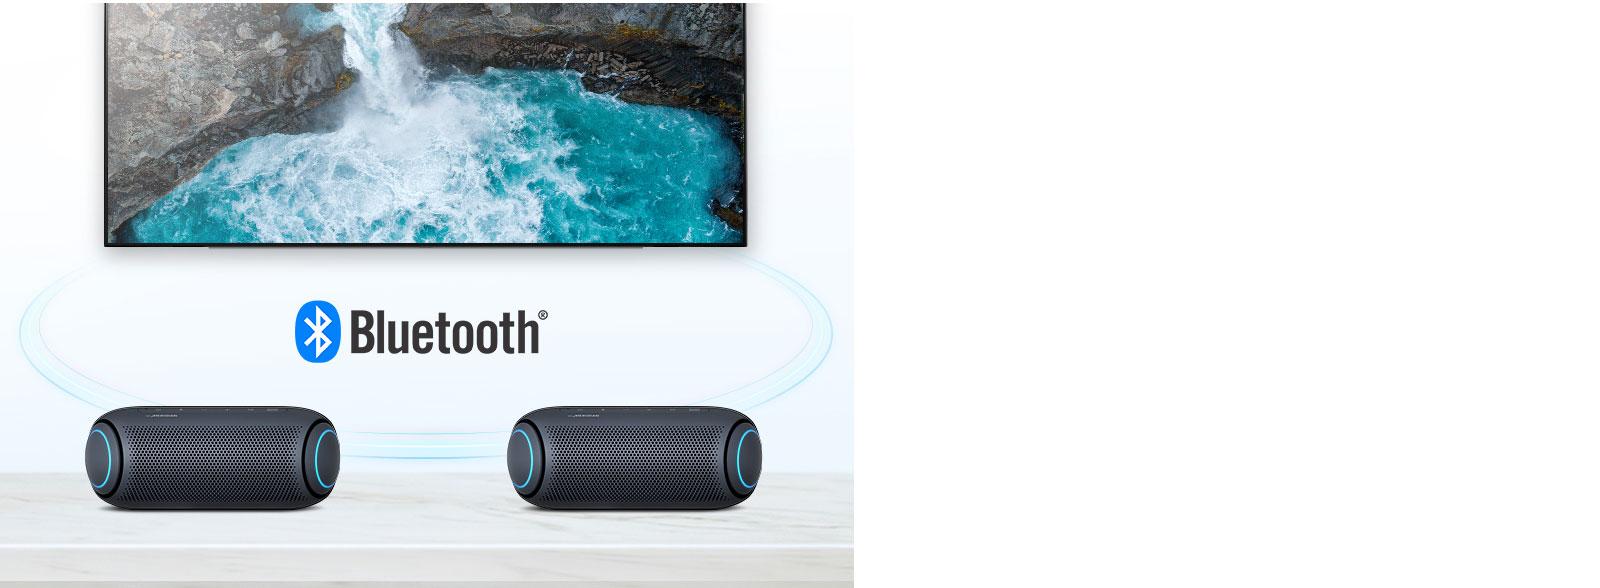 LG XBOOM Go สองเครื่องที่สีแสงสีน้ำเงินบนโต๊ะวางอยู่ด้านหน้าทีวีที่กำลังแสดงภาพน้ำตก